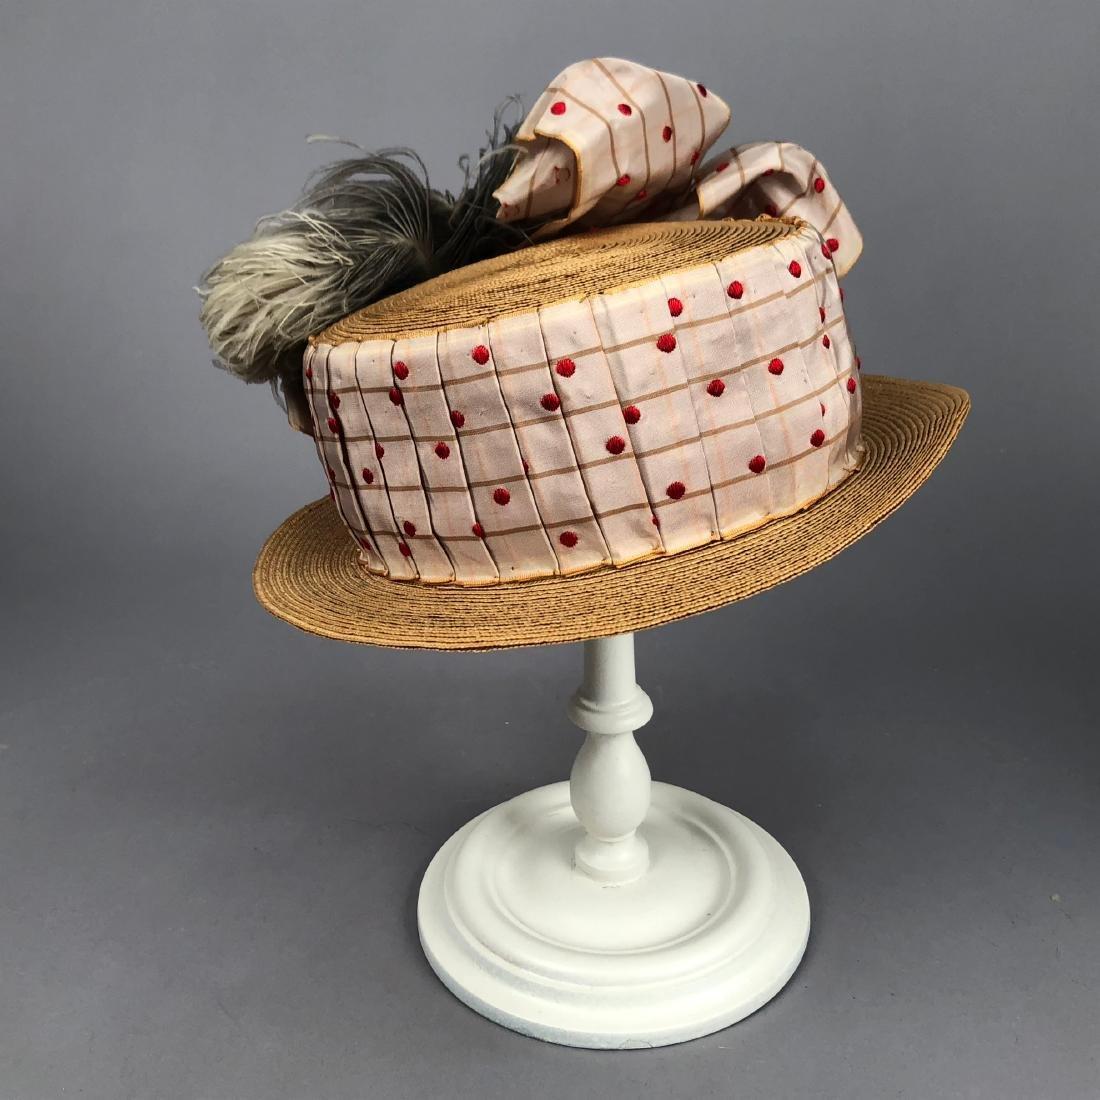 TWO WIDE-BRIM STRAW HATS, 1905 - 1915 - 3